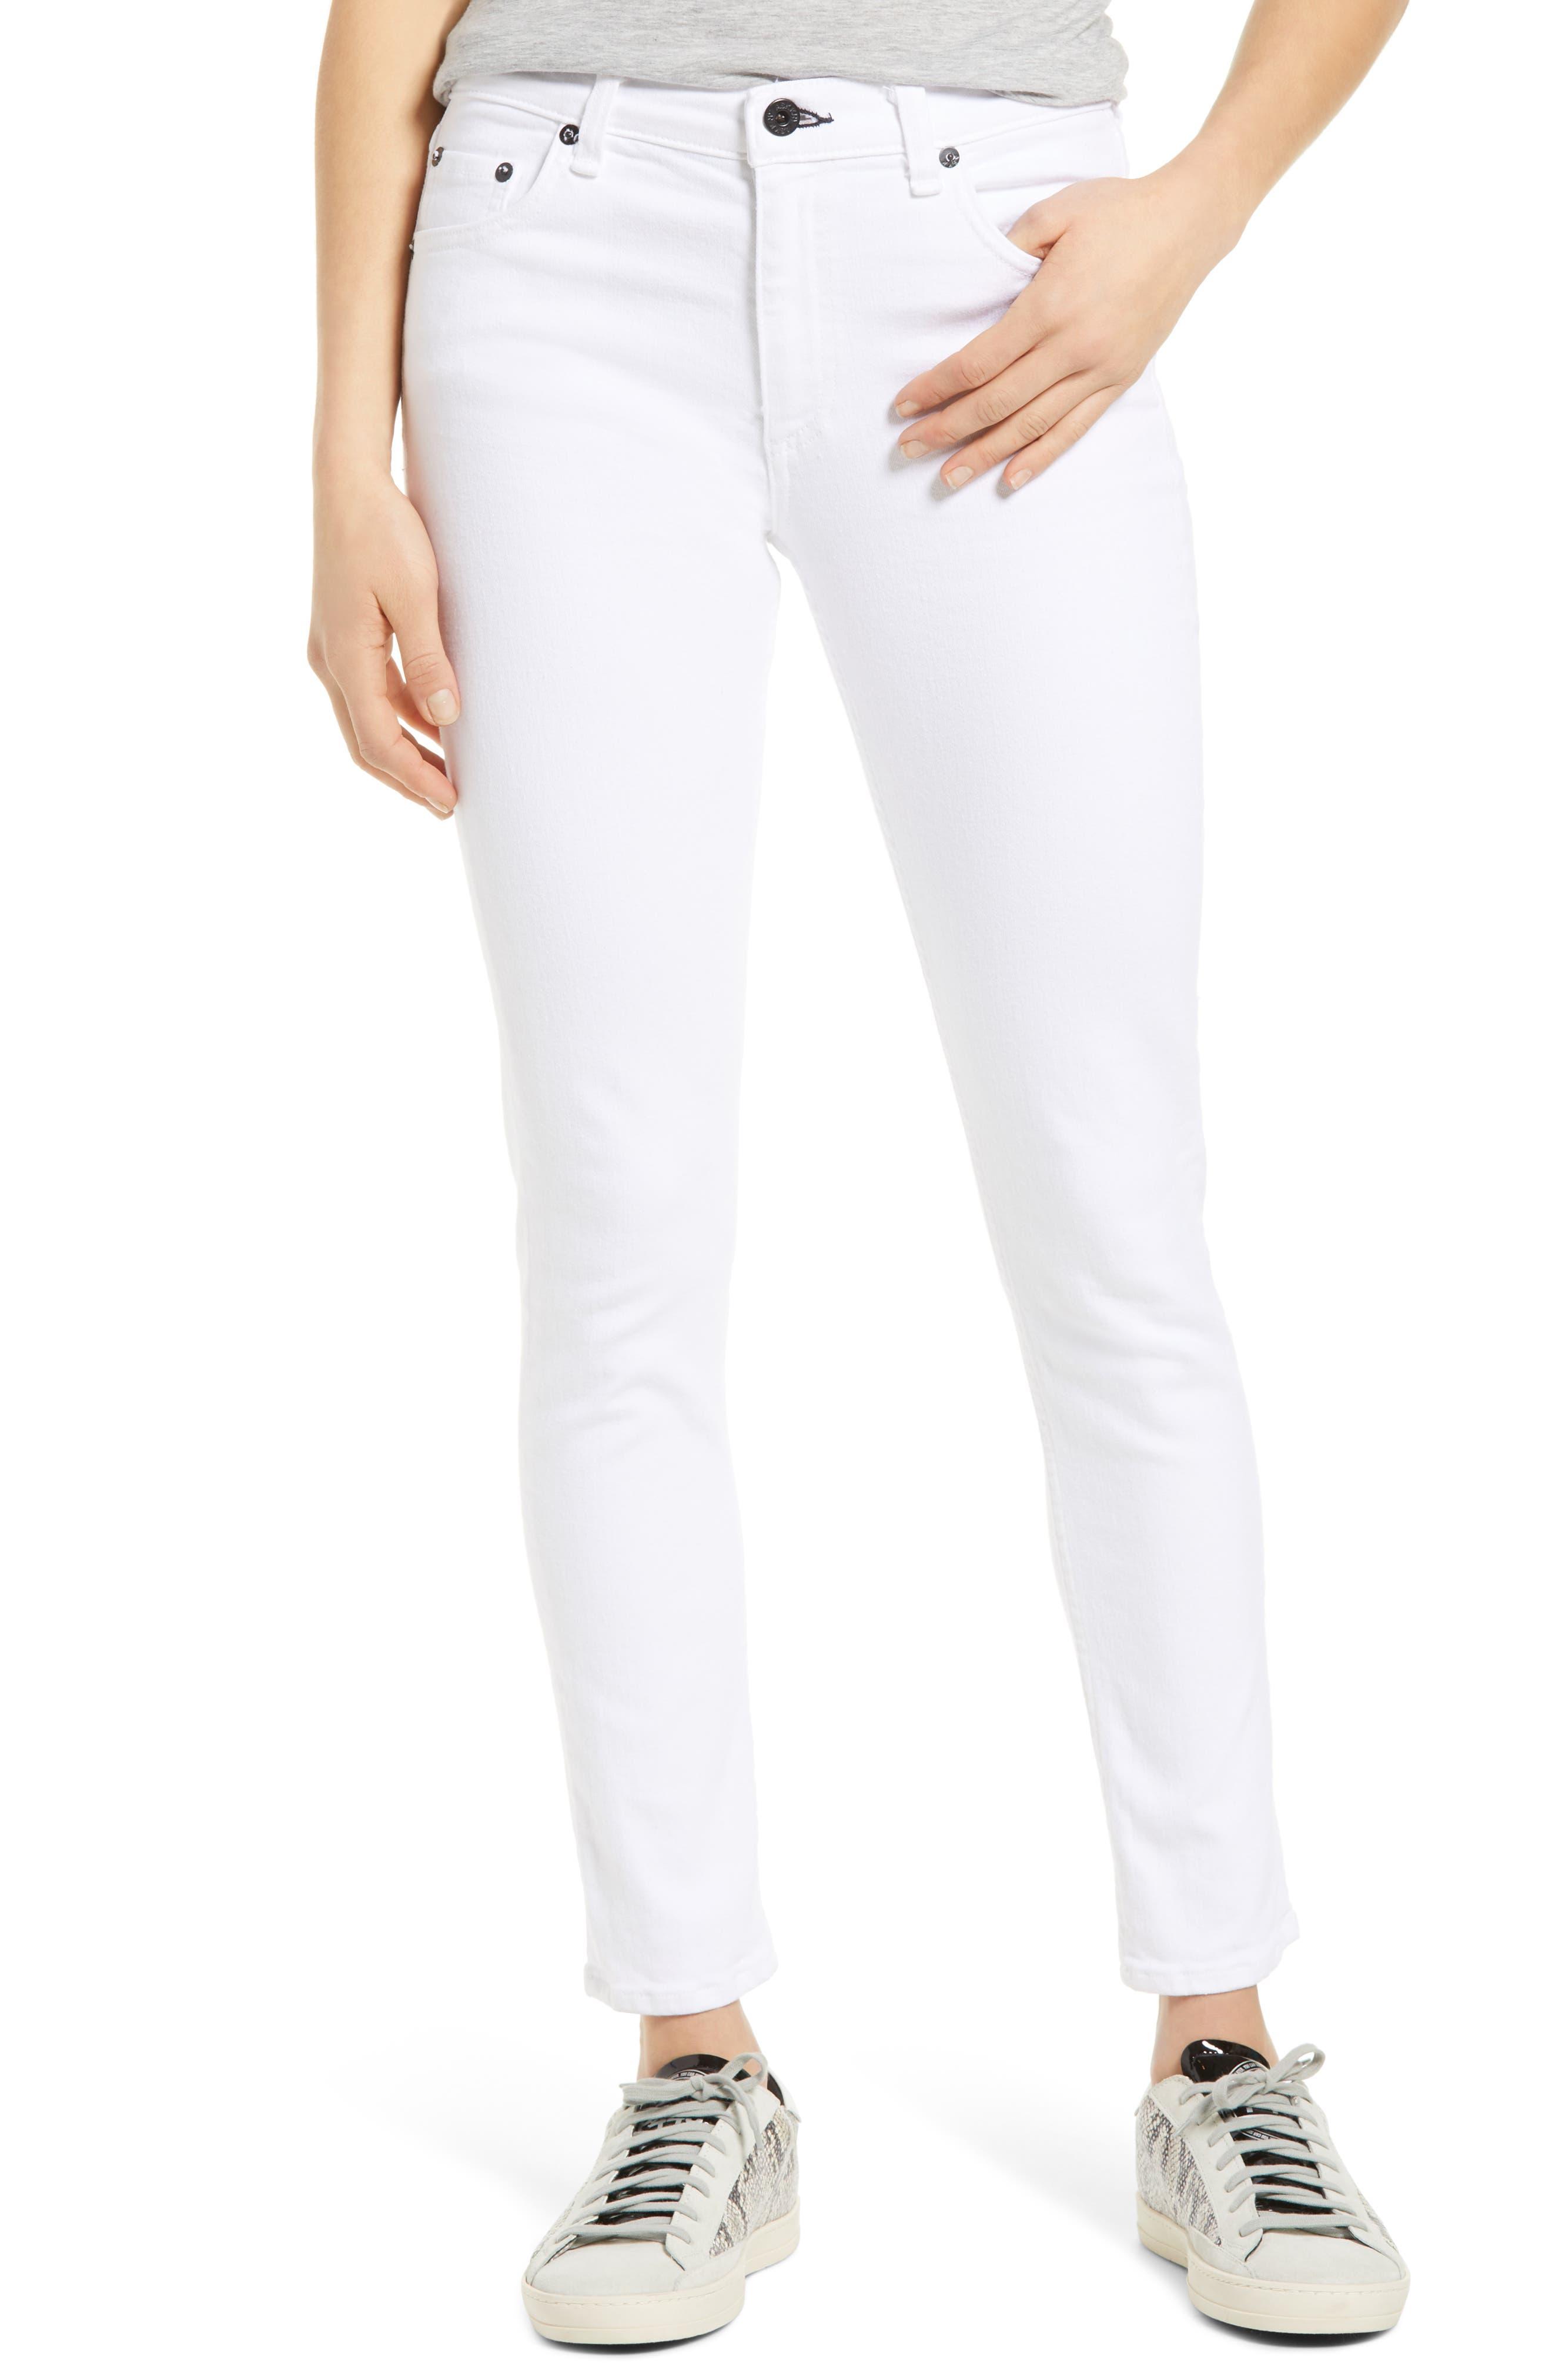 Jax High Waist Ankle Skinny Jeans